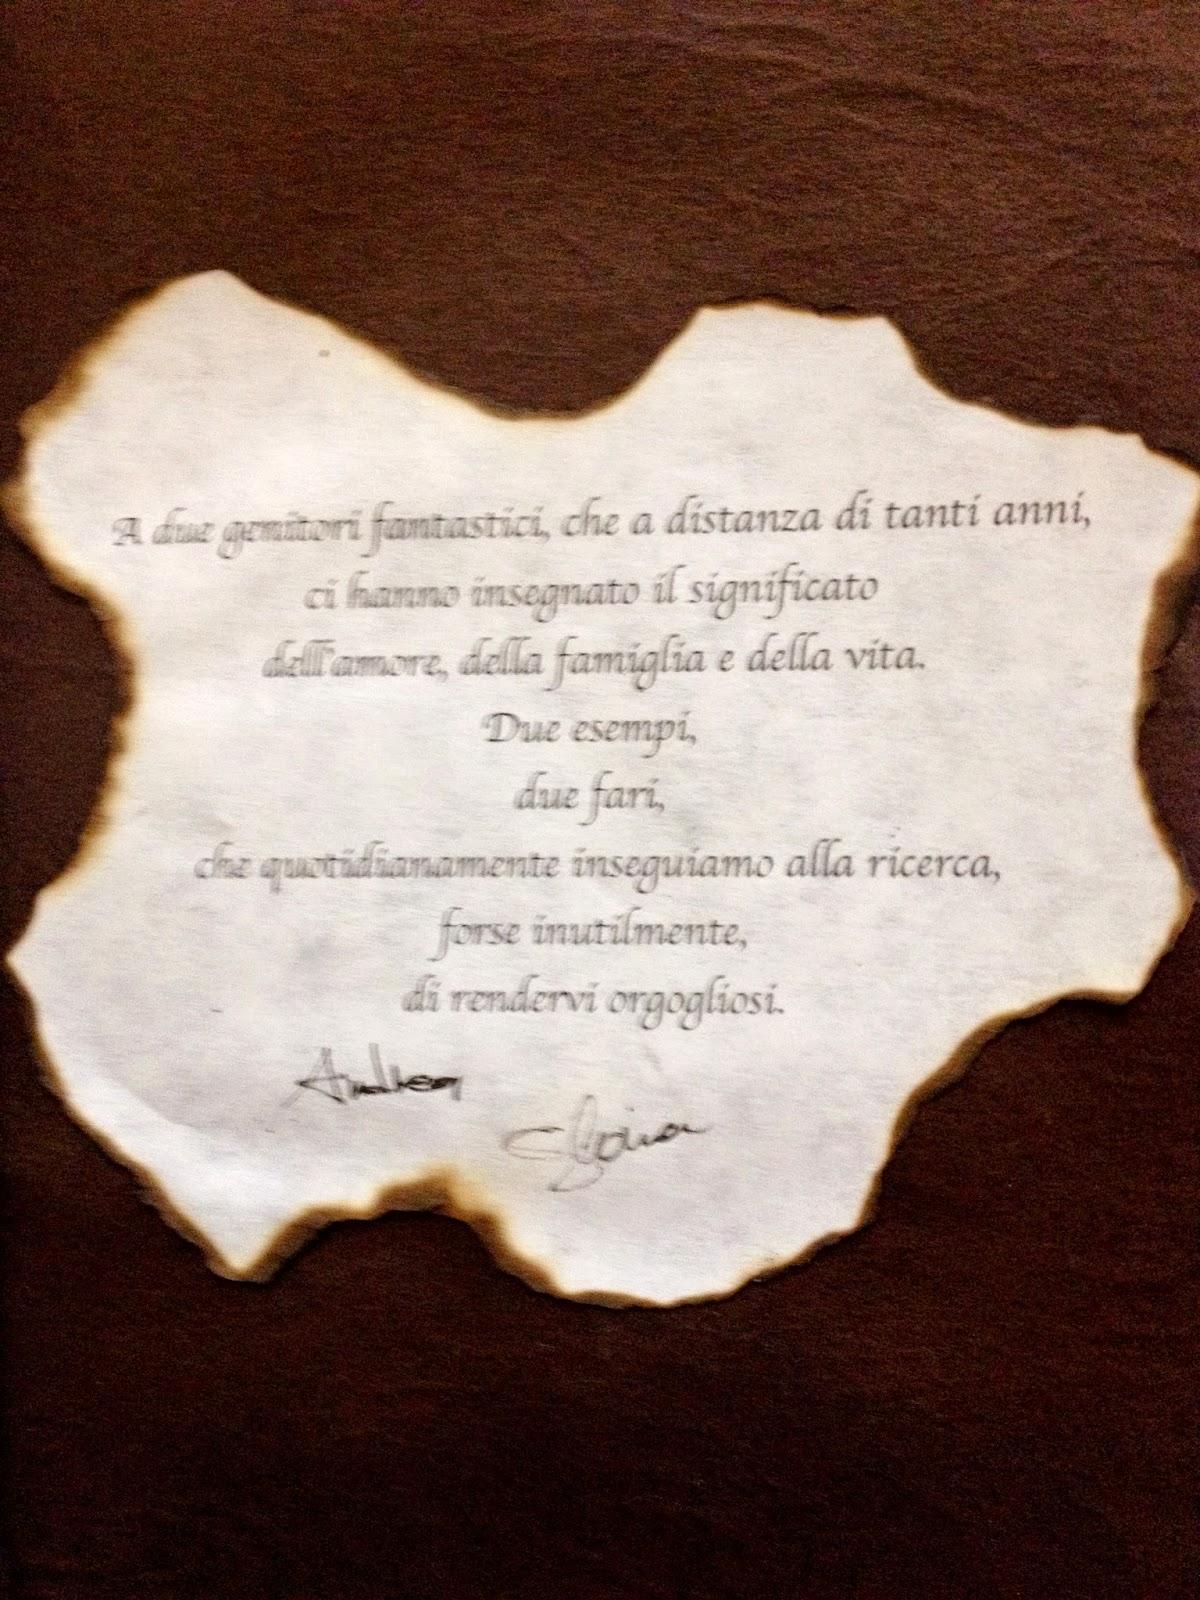 Frasi Matrimonio Libretto.Frasi Religiose Per Libretto Matrimonio